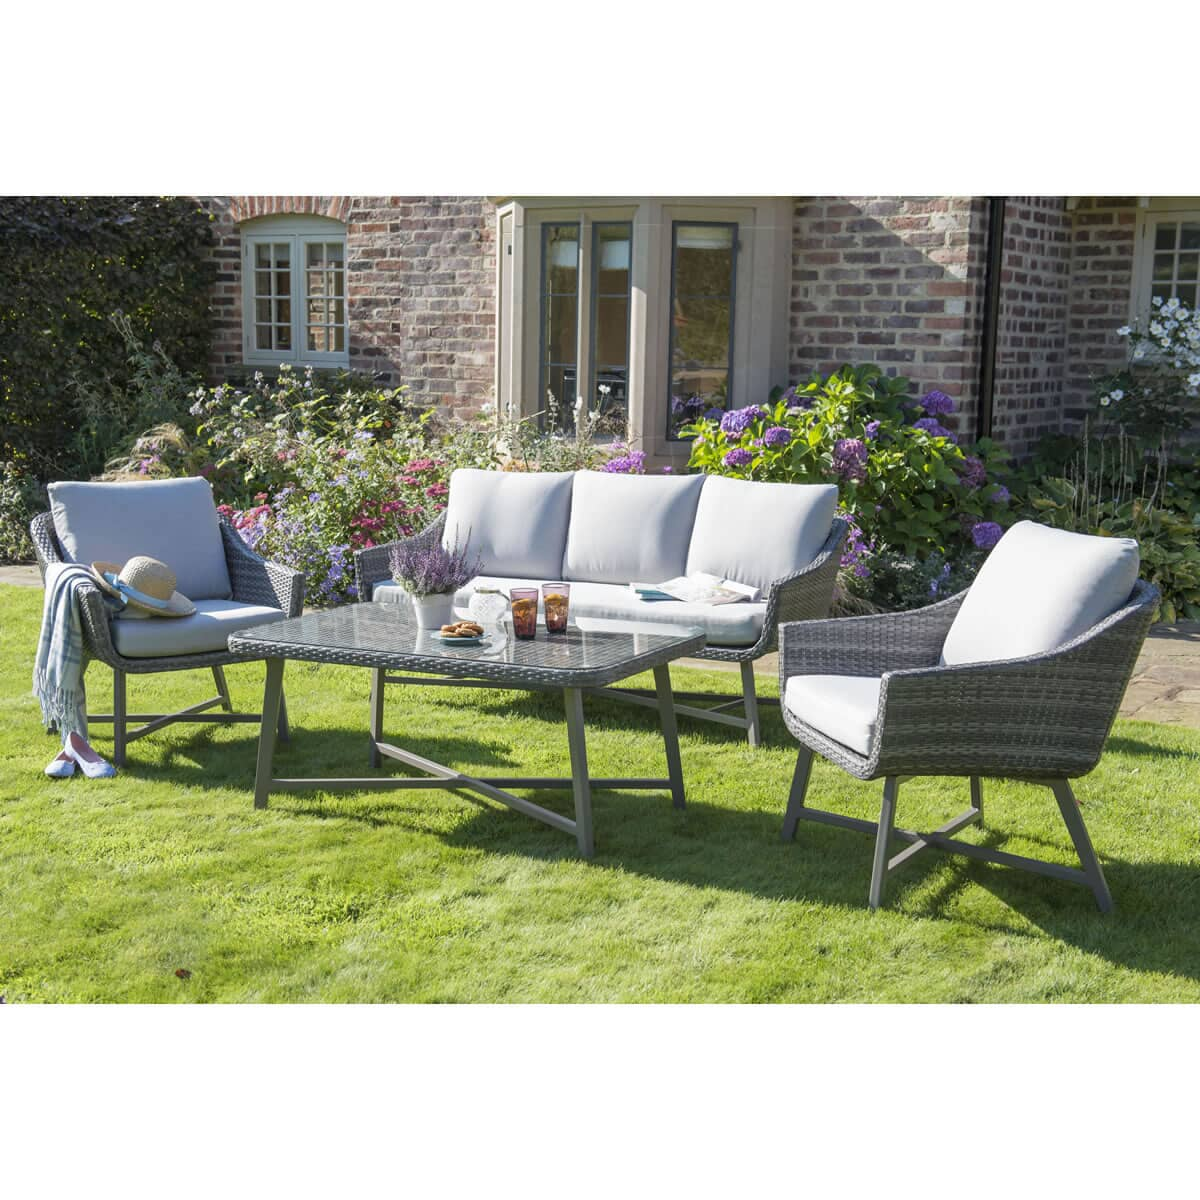 Kettler Lamode Large Lounge Set Klamoset03 Garden